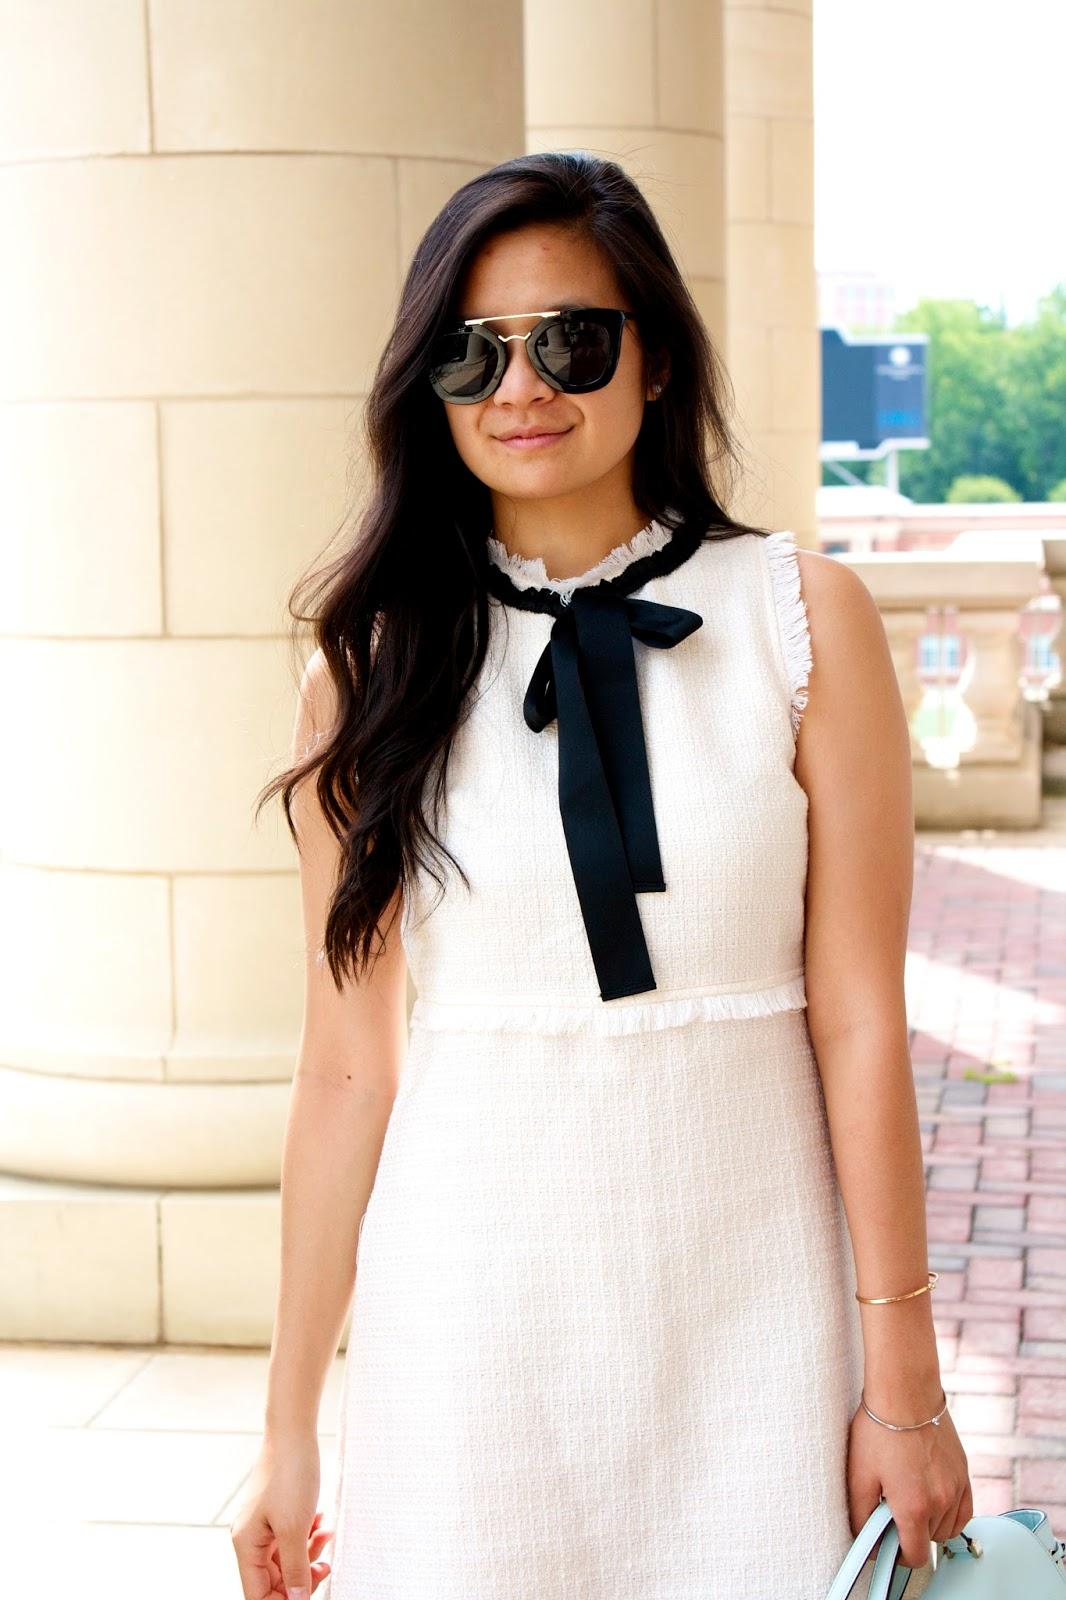 SheIn white tweed dress